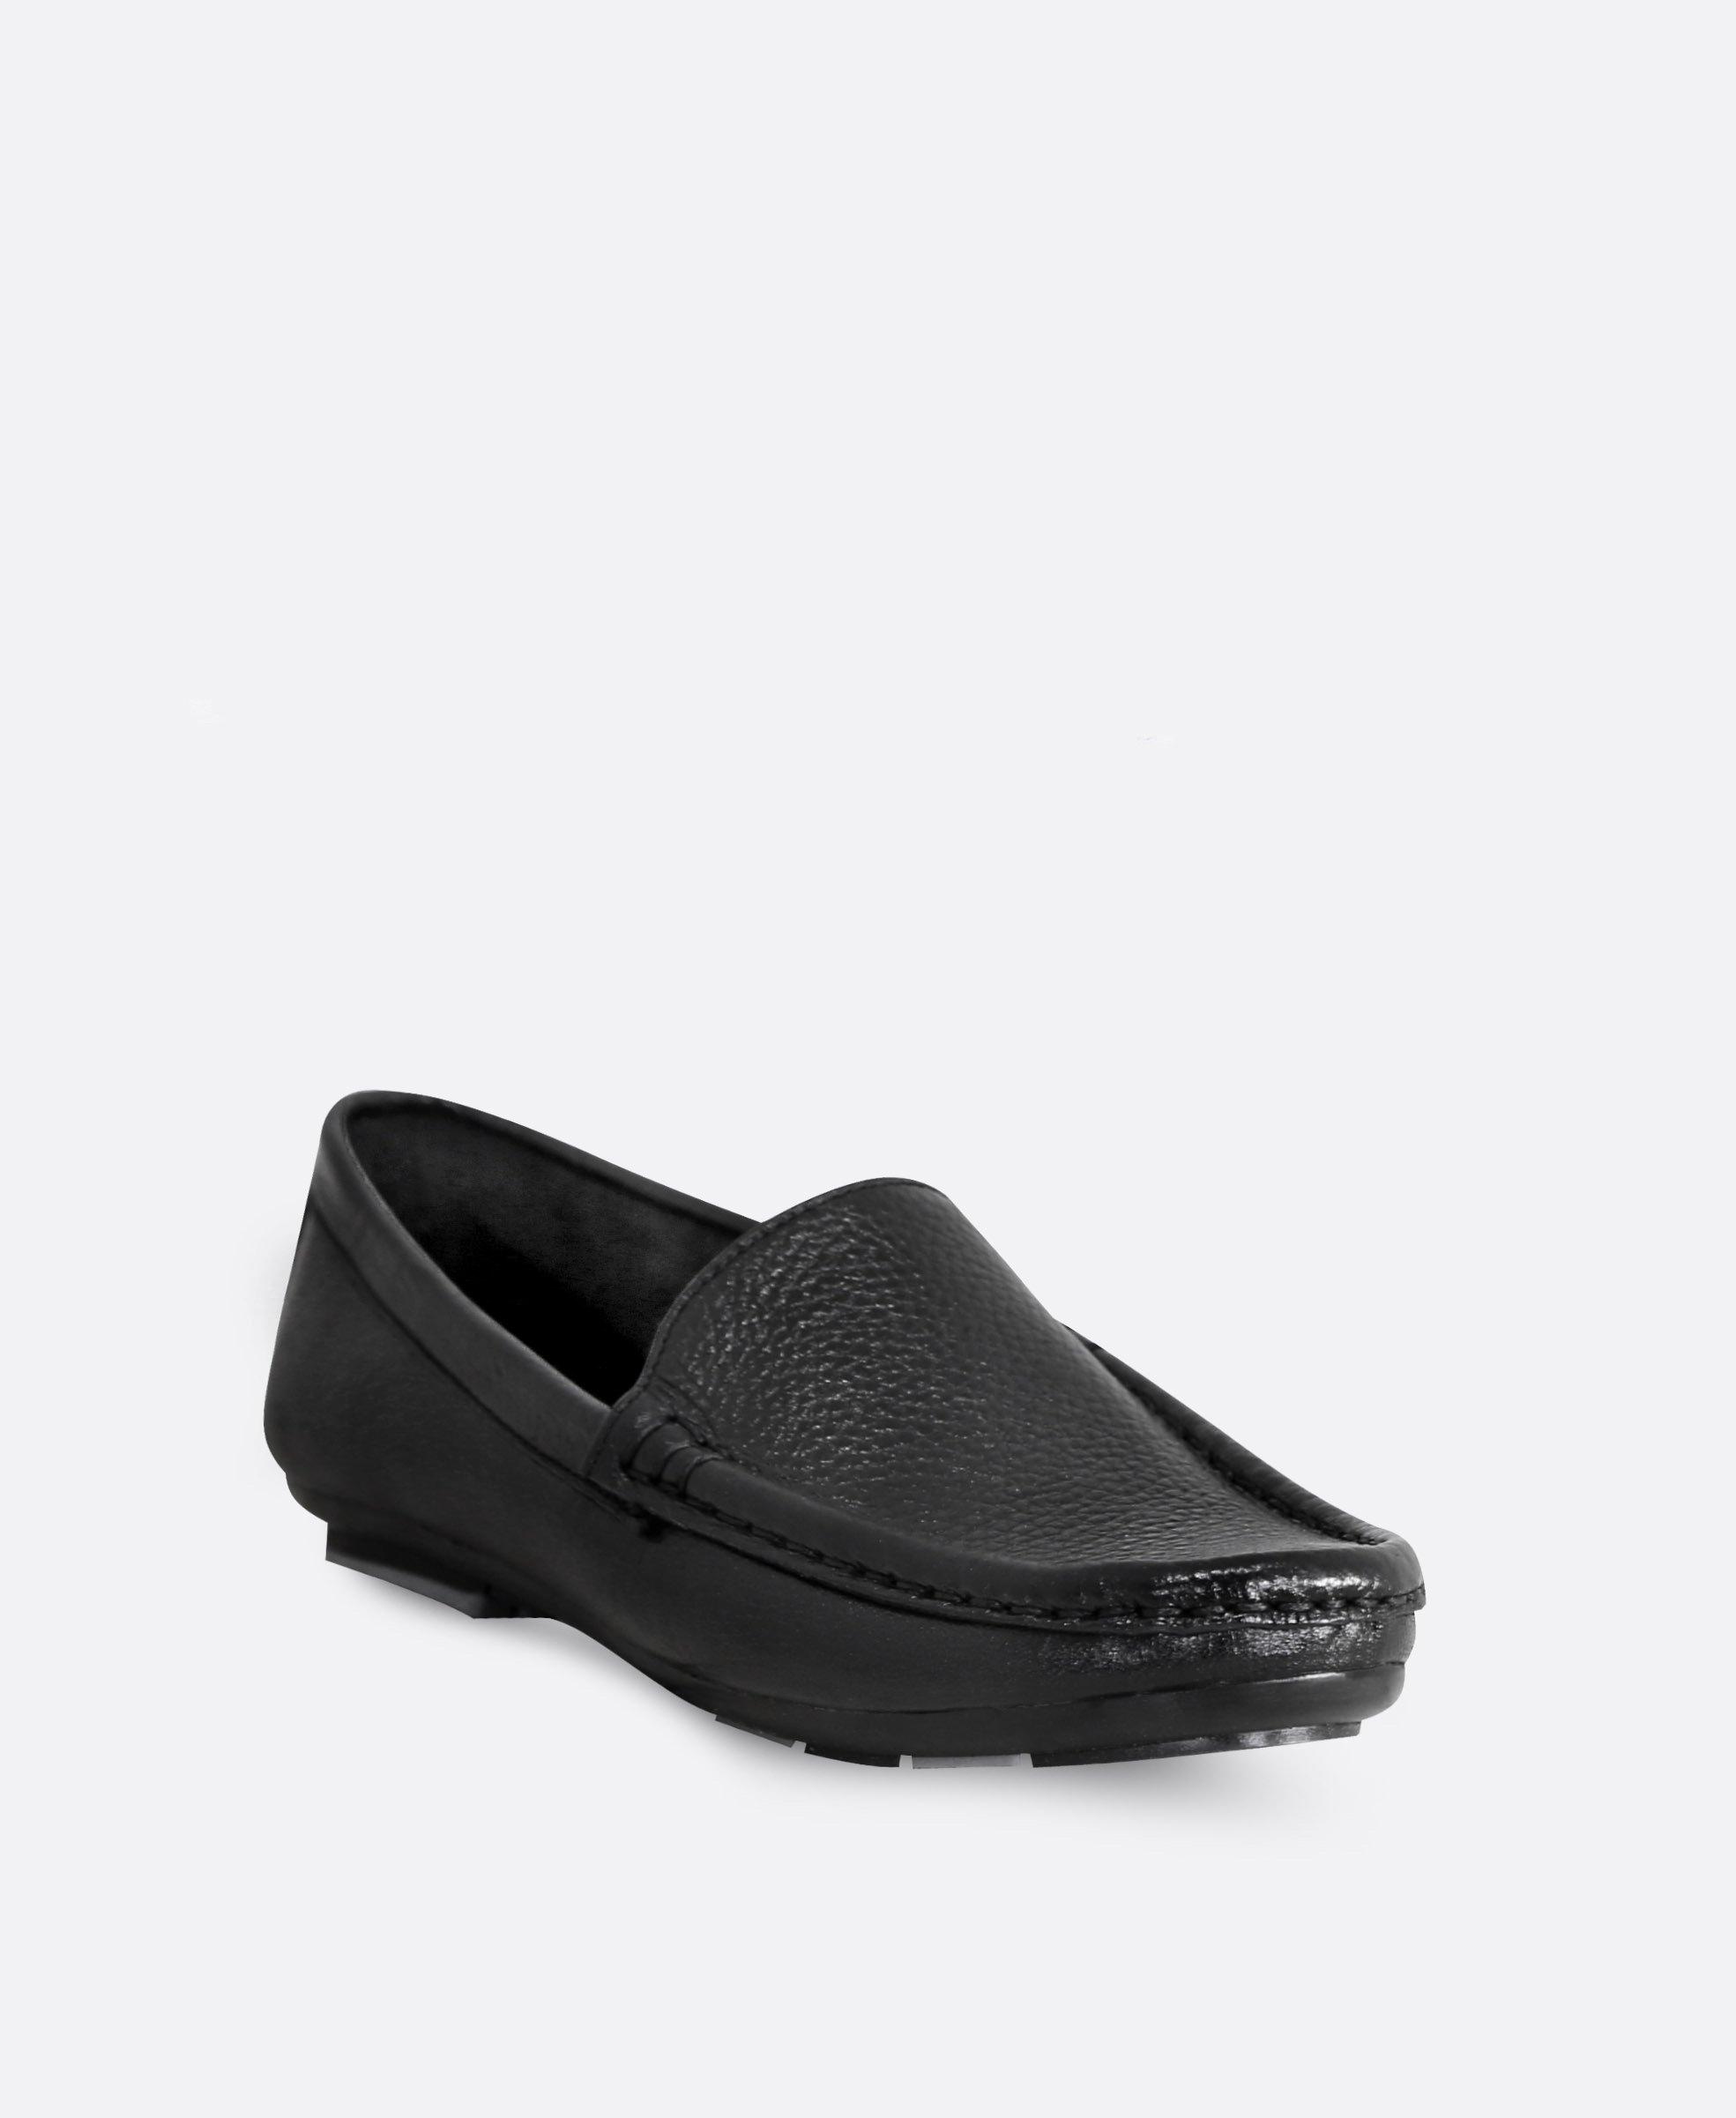 کفش زنانه چرم 0437